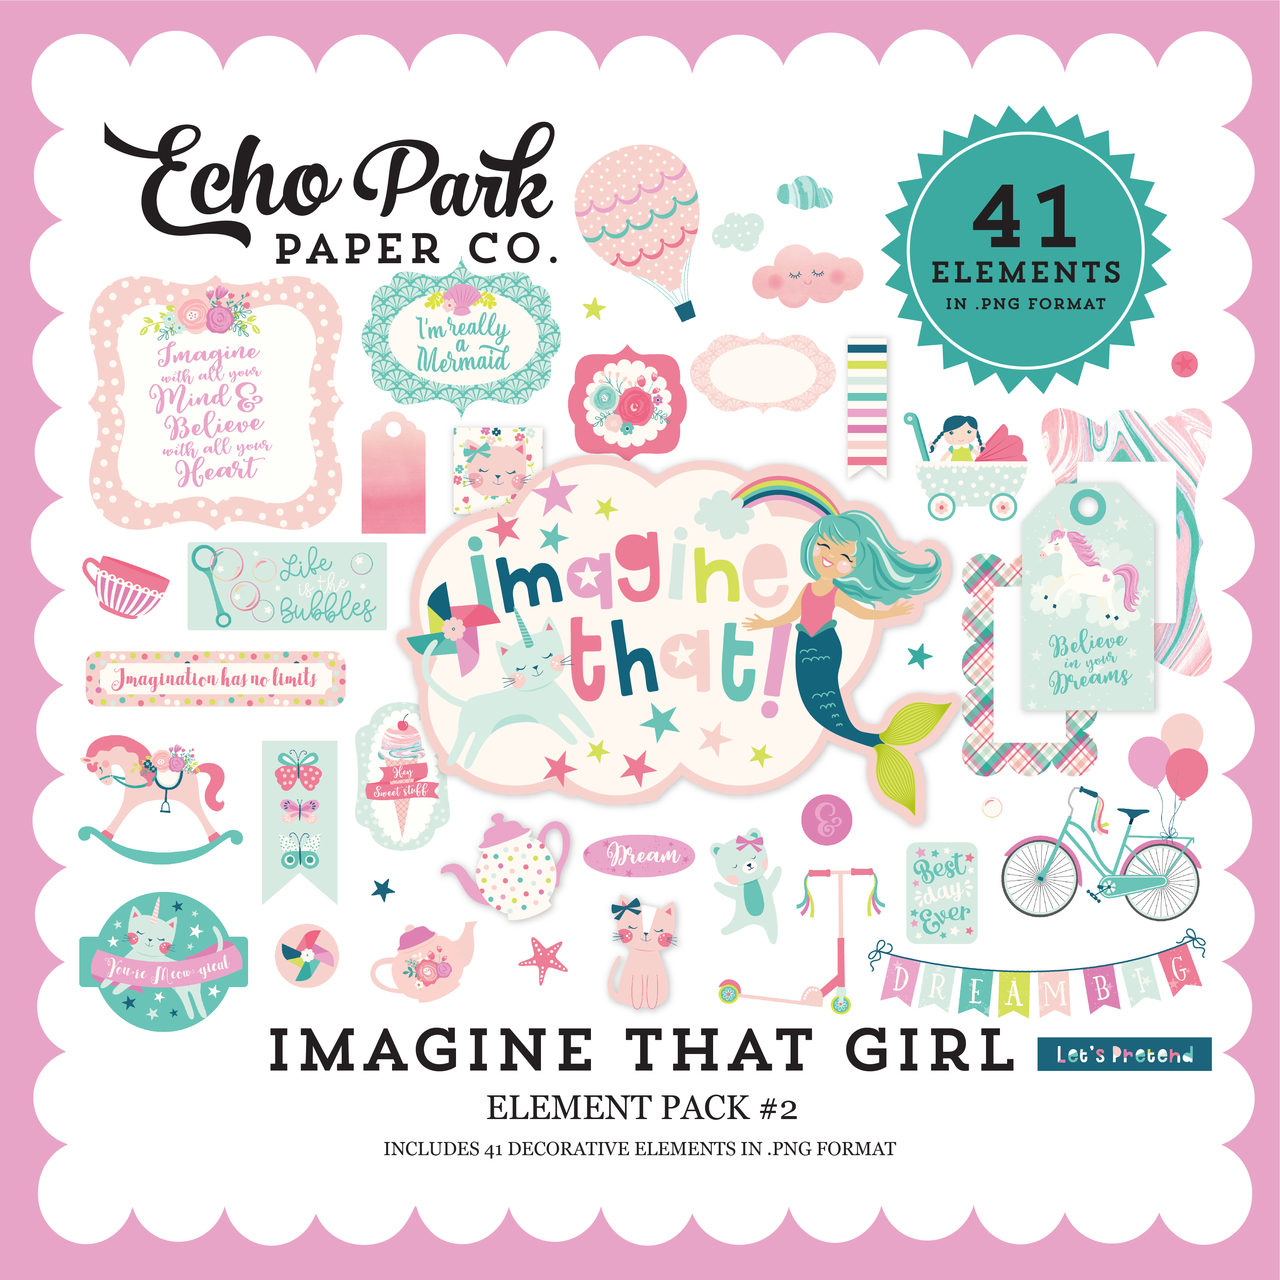 Imagine That Girl Element Pack #2